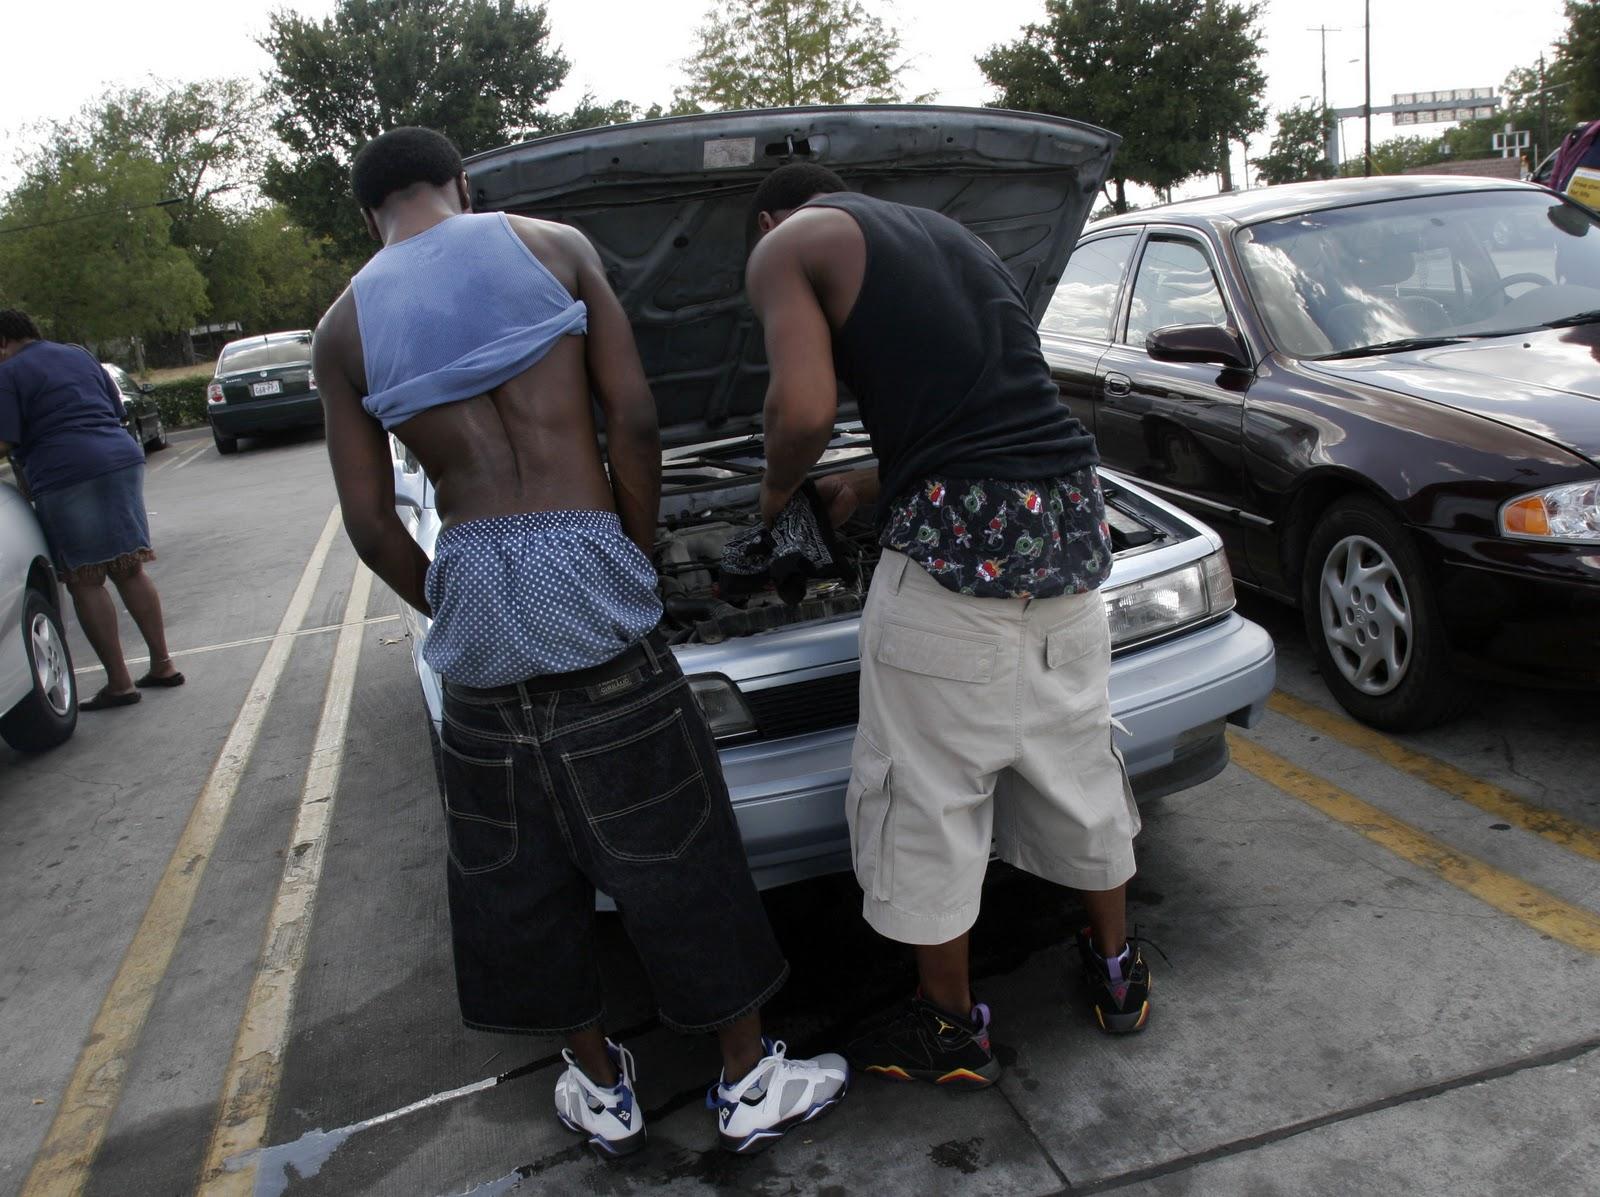 sagging pants easier cops catch